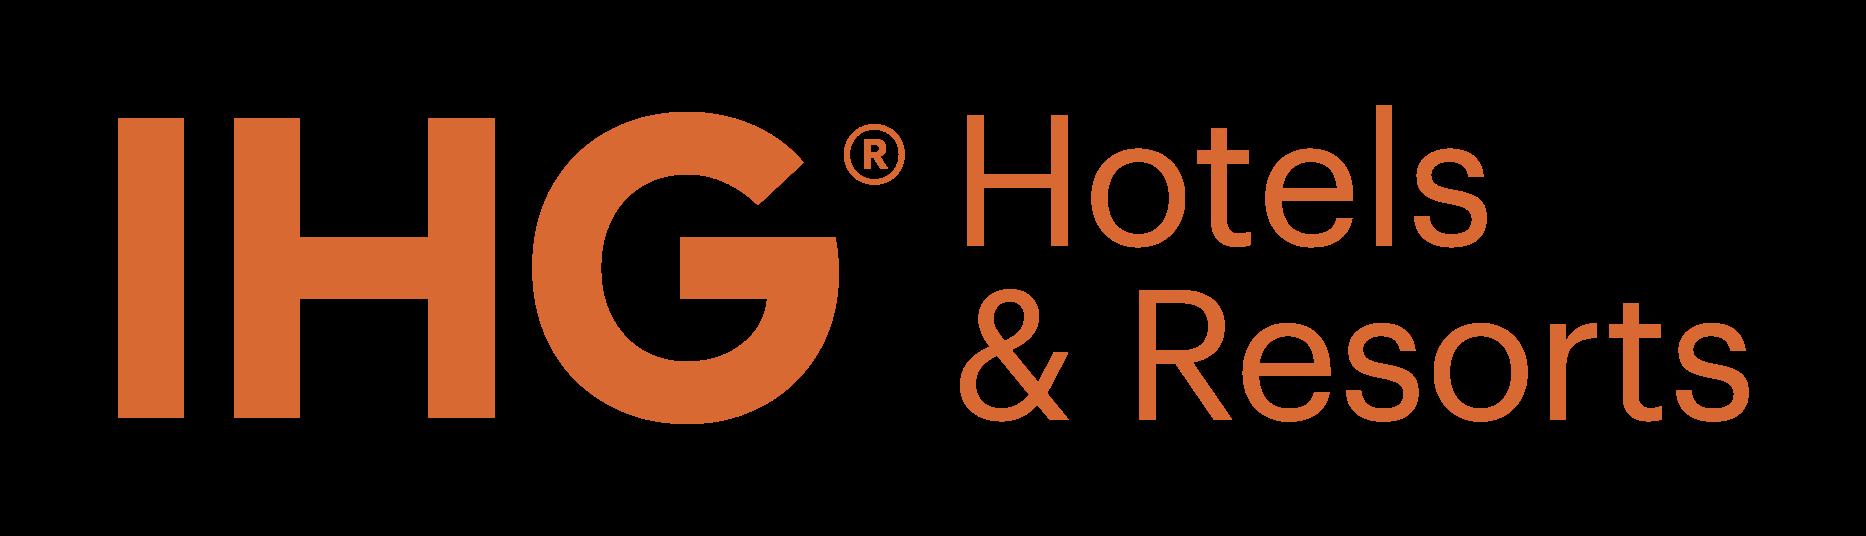 InterContinental Hotels & Resorts Coupons and Promo Codes